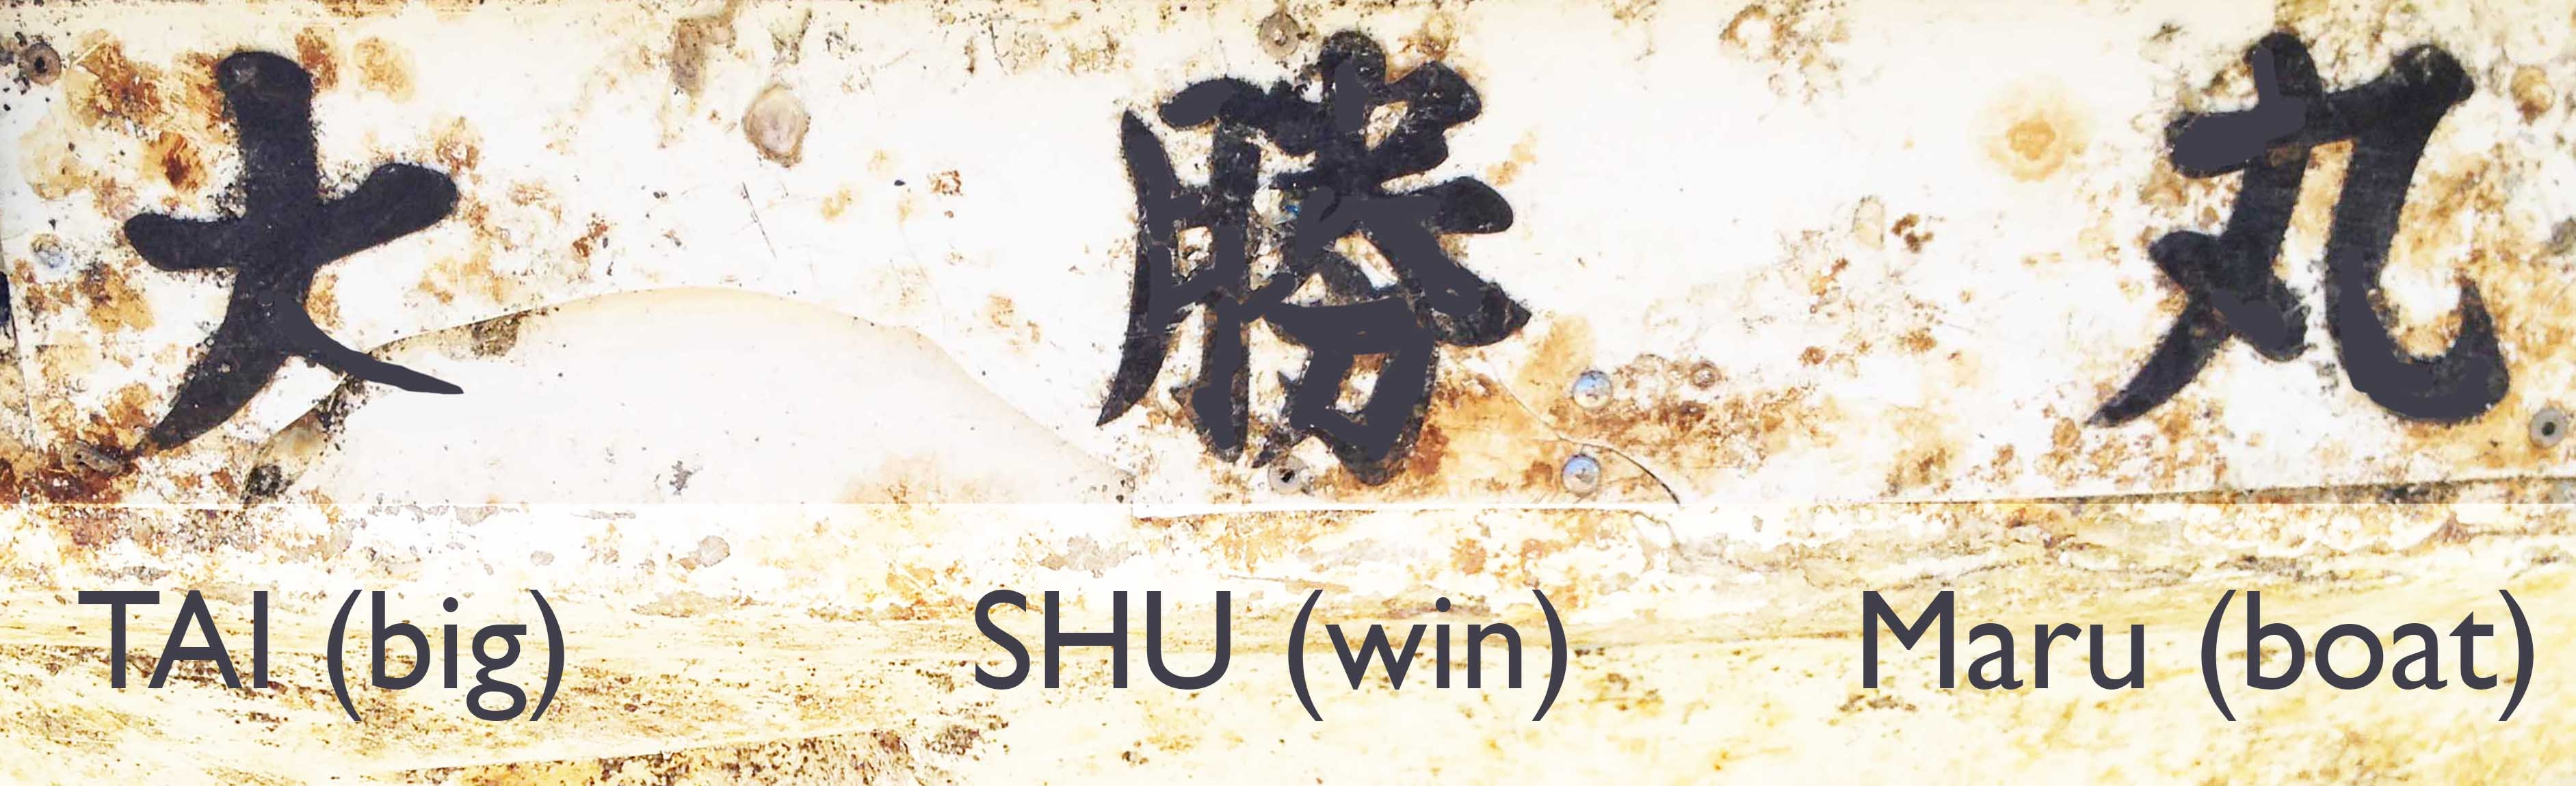 Tai Shu Maru characters